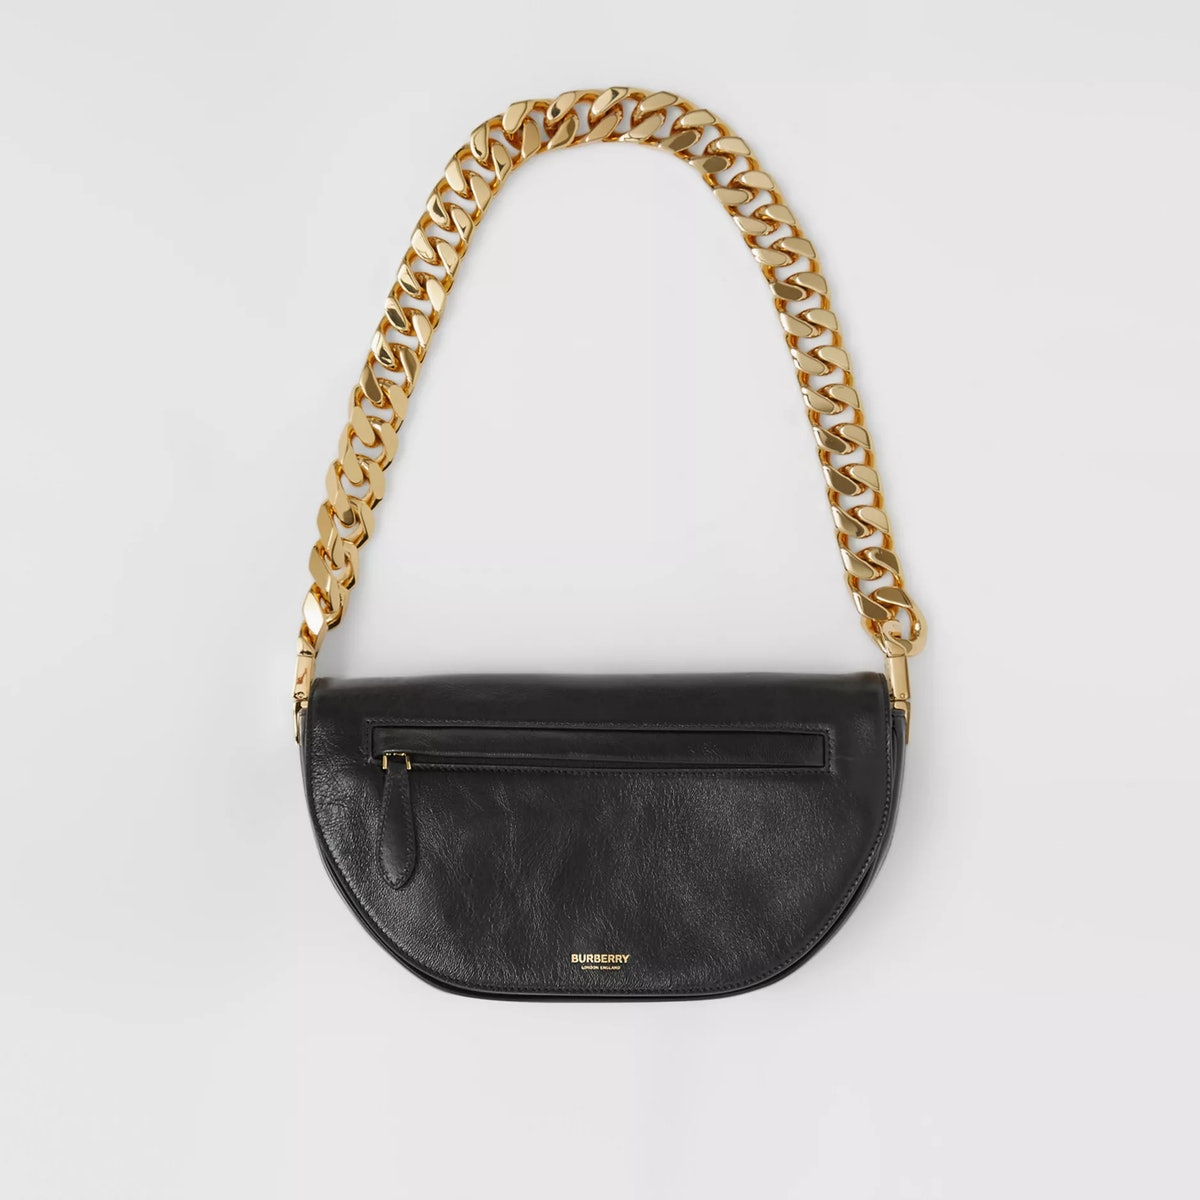 Small Burberry Olympia bag in black lambskin.